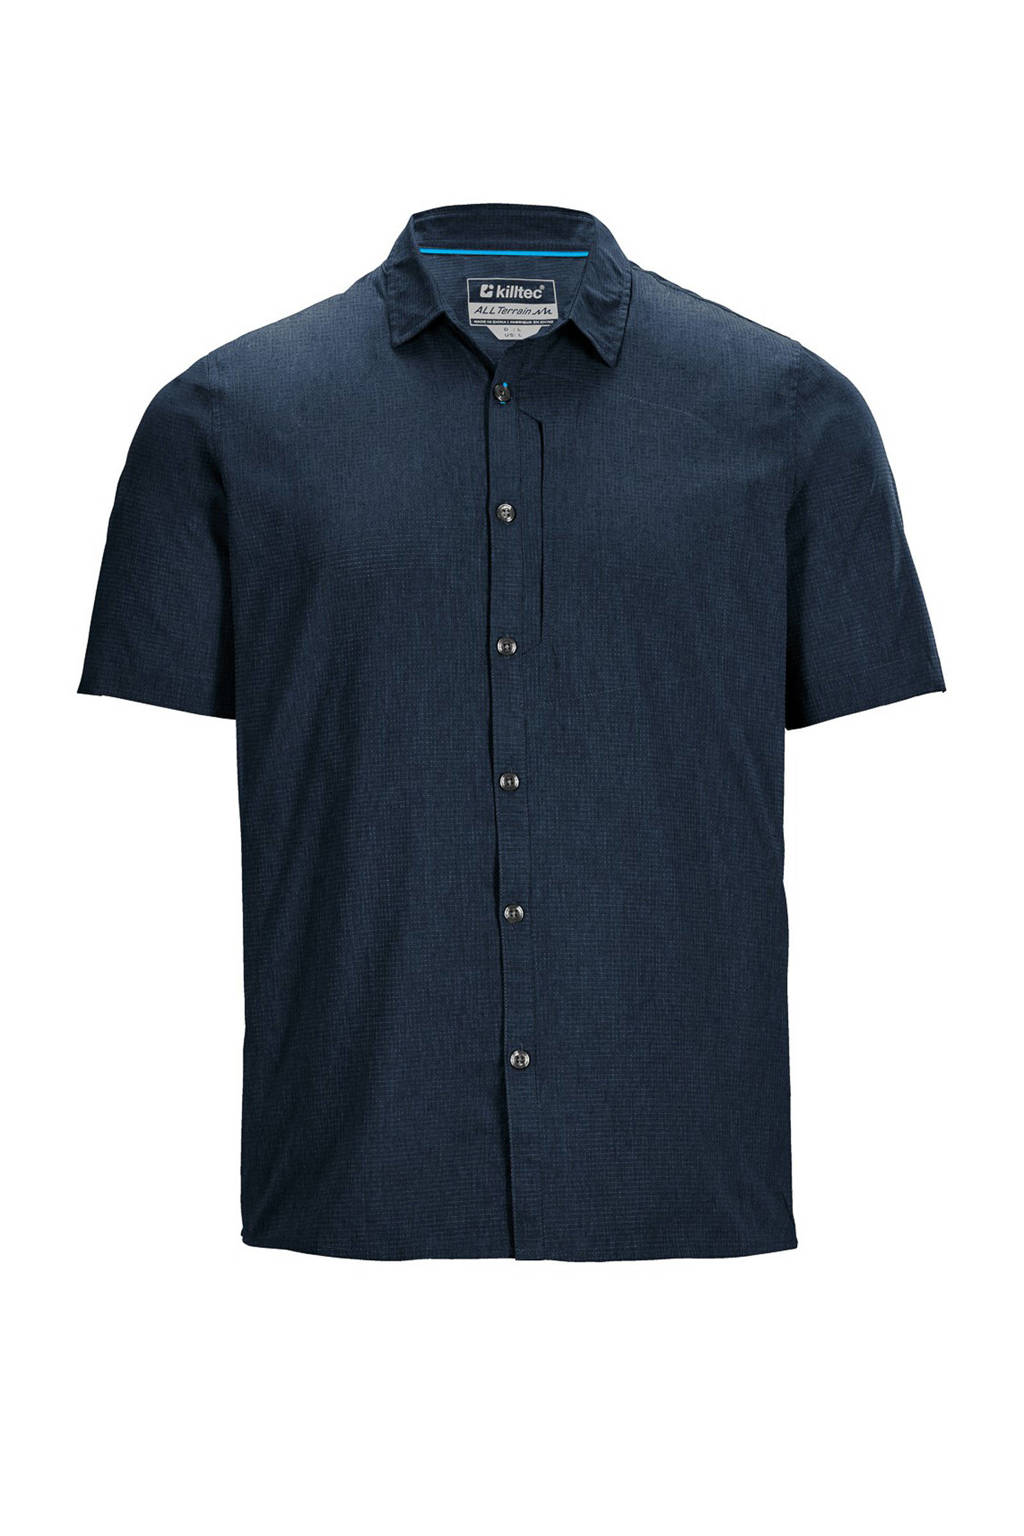 Killtec outdoor overhemd Rodby donkerblauw, Donkerblauw